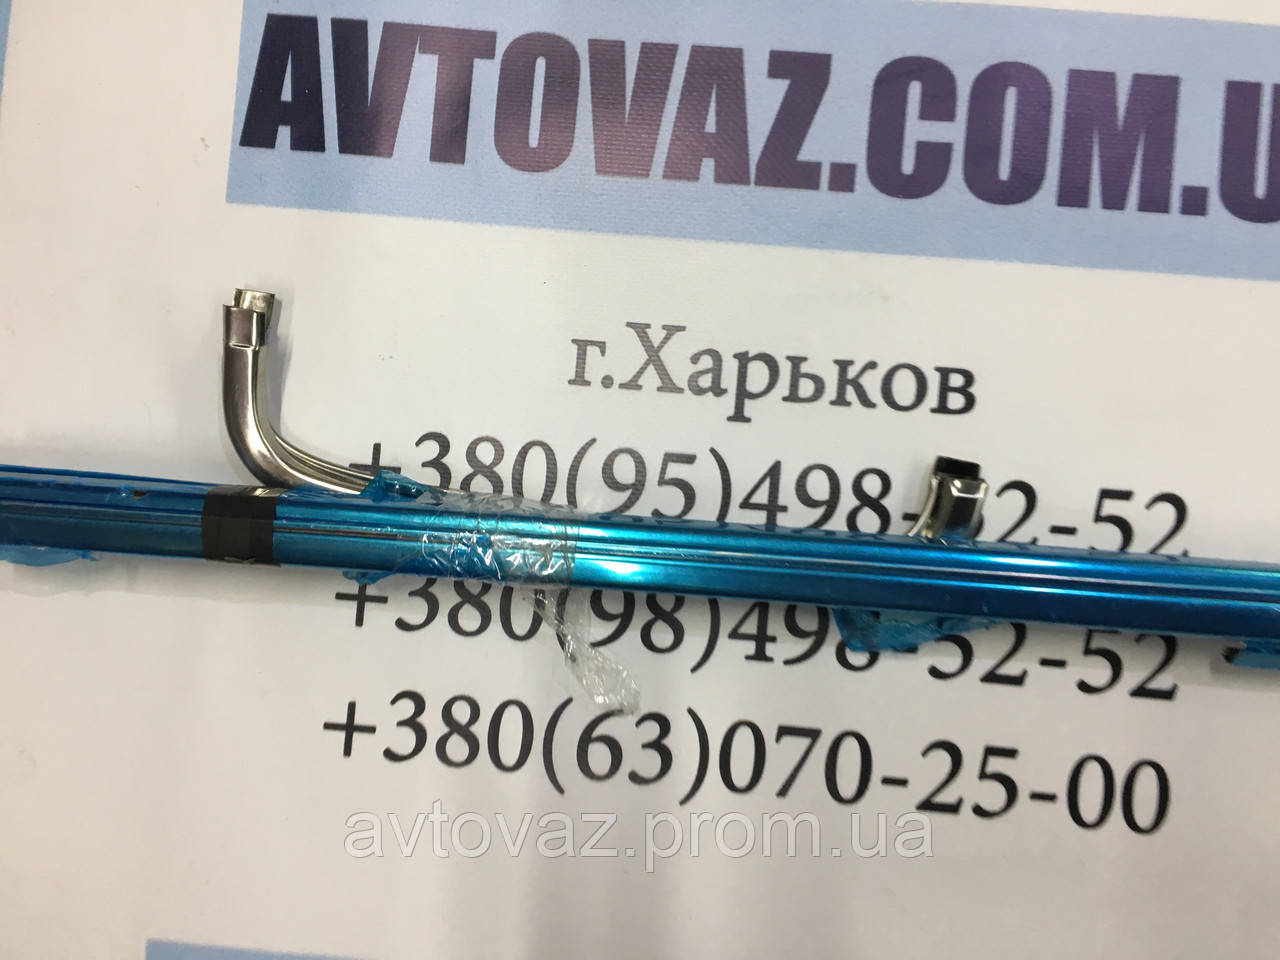 Молдинг стекл ВАЗ 2103, ВАЗ 2106 хром (Накладка)